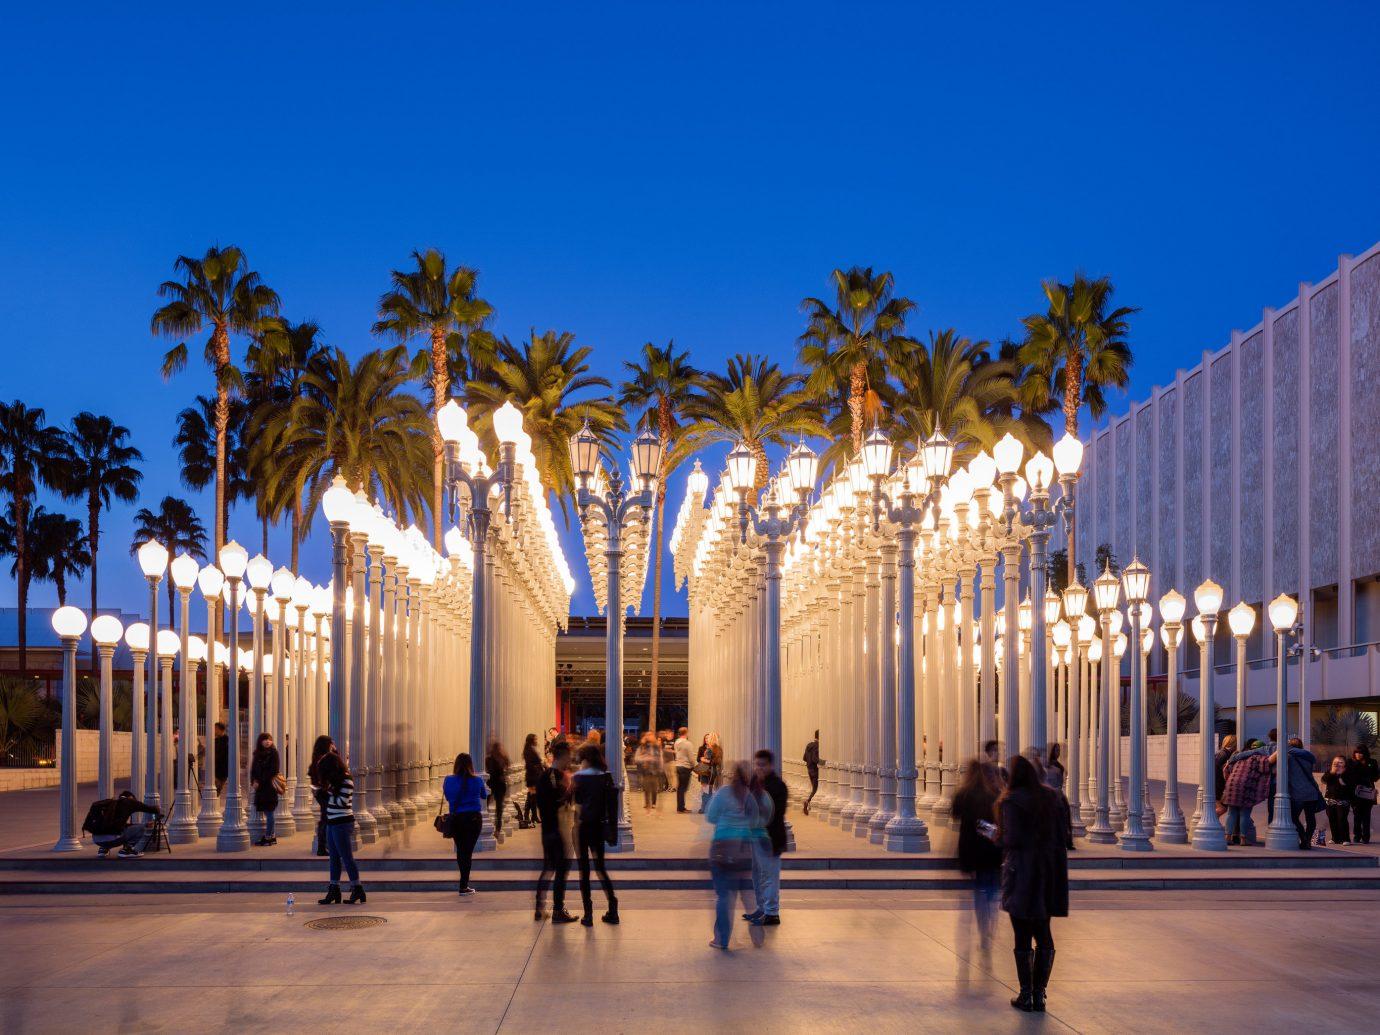 Trip Ideas sky outdoor landmark plaza Architecture town square lighting tourist attraction